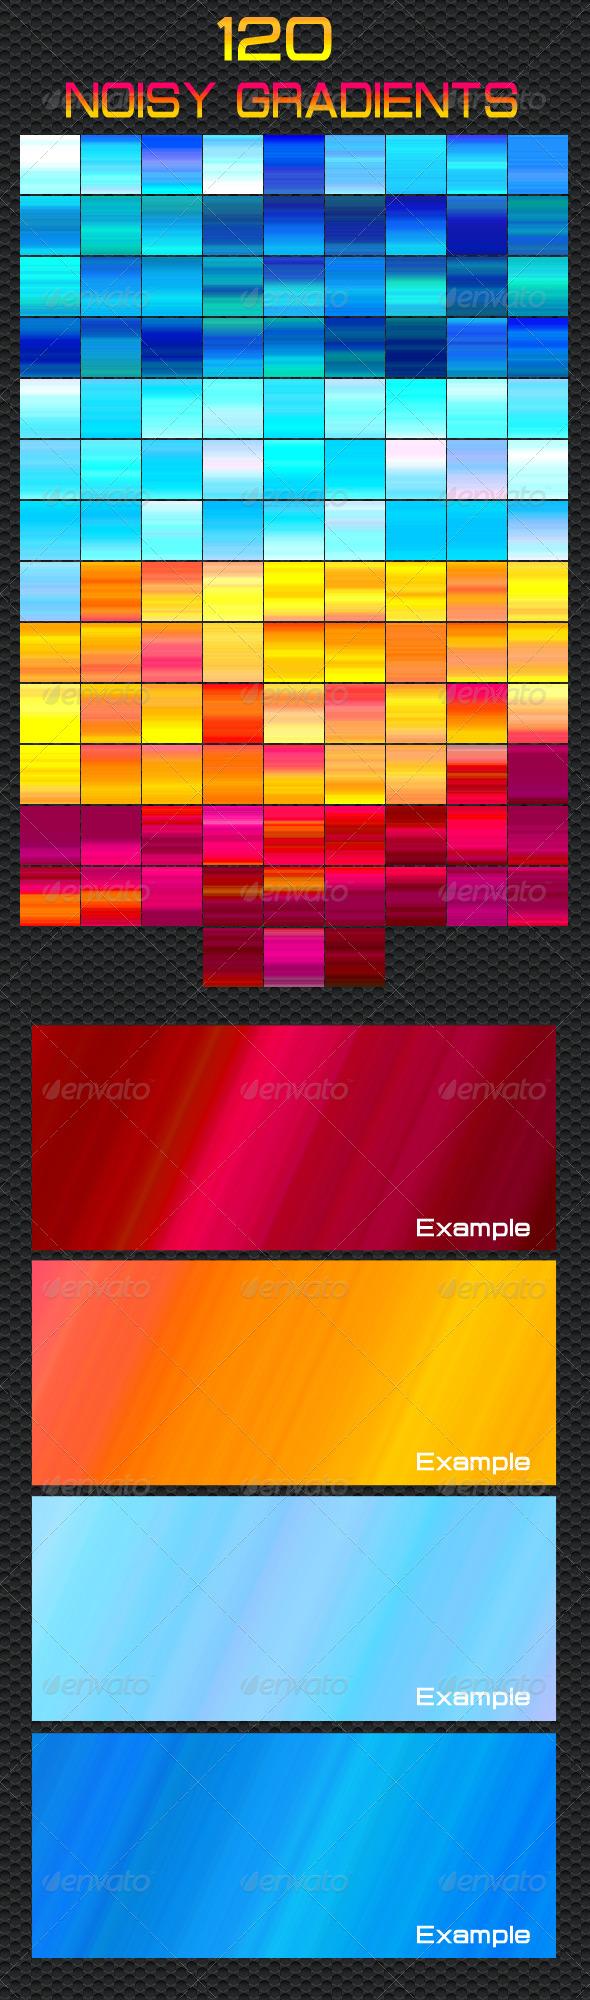 GraphicRiver 120 Noisy Gradients 5310467